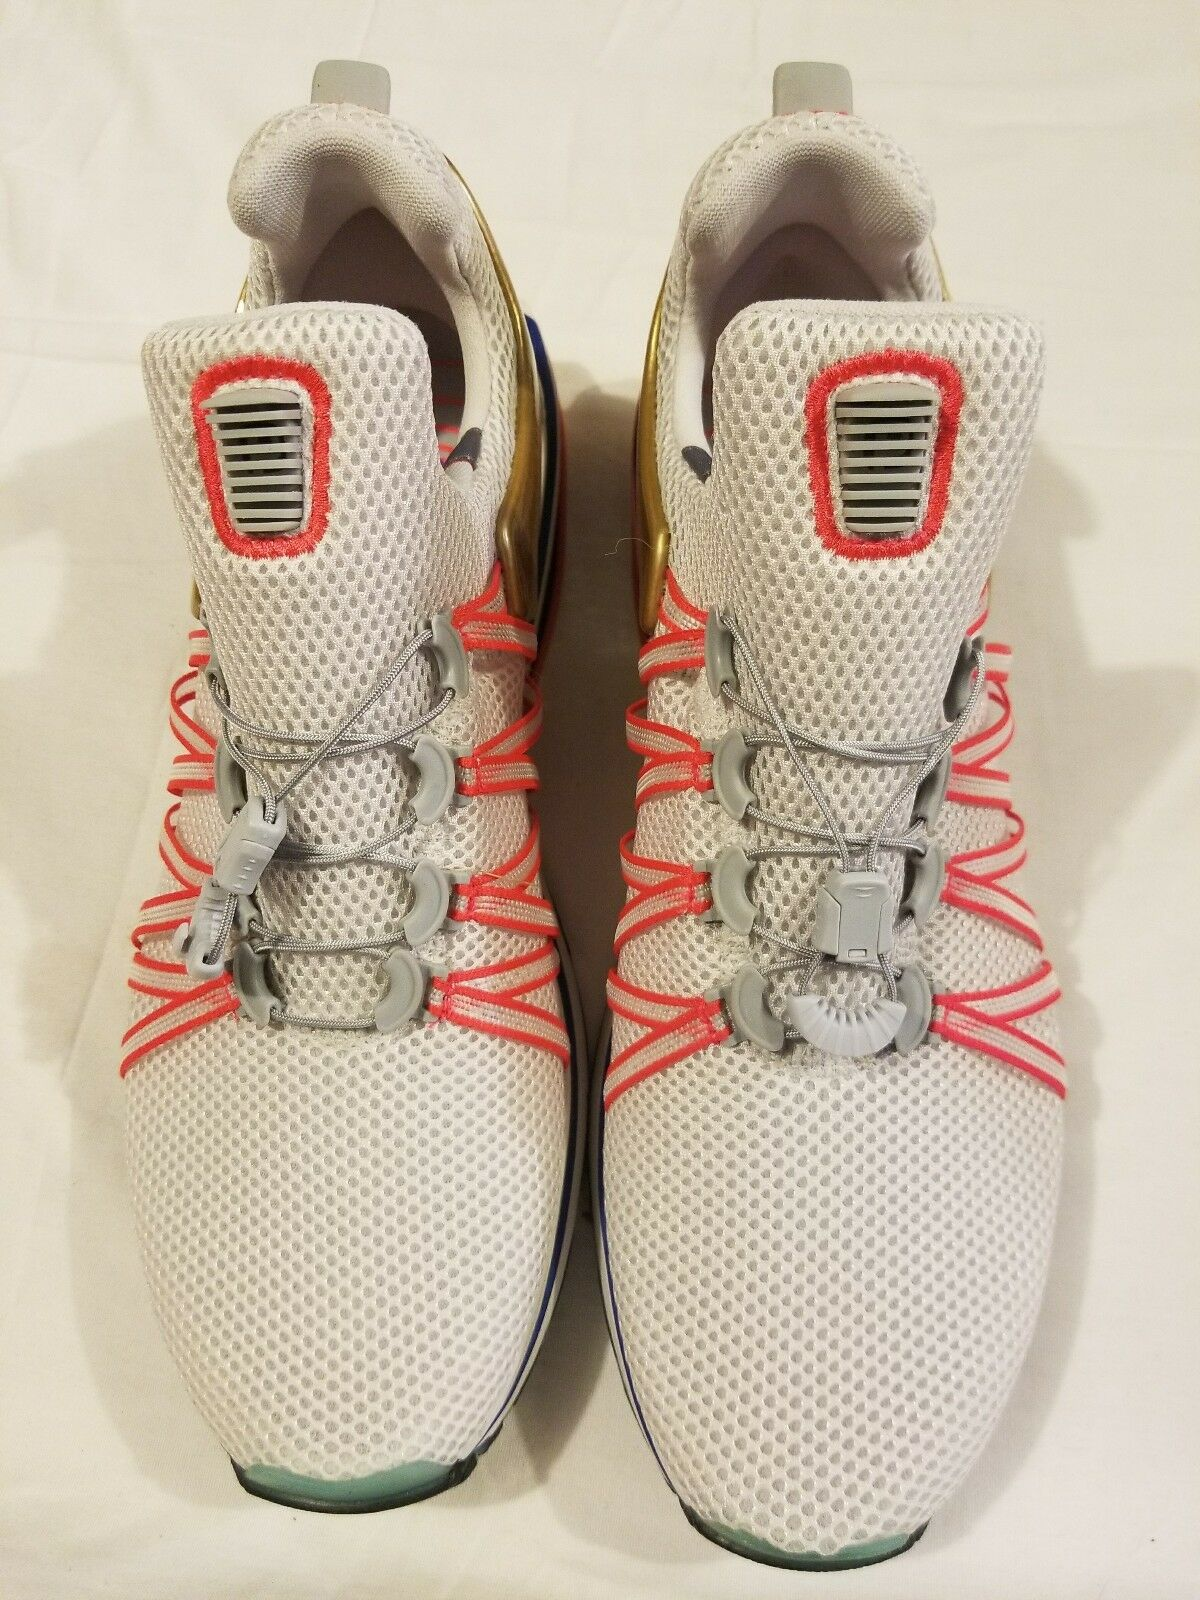 Nike Shox Gravity RWB Metallic gold 11.5 2018 LIMITED EDITION Running Training